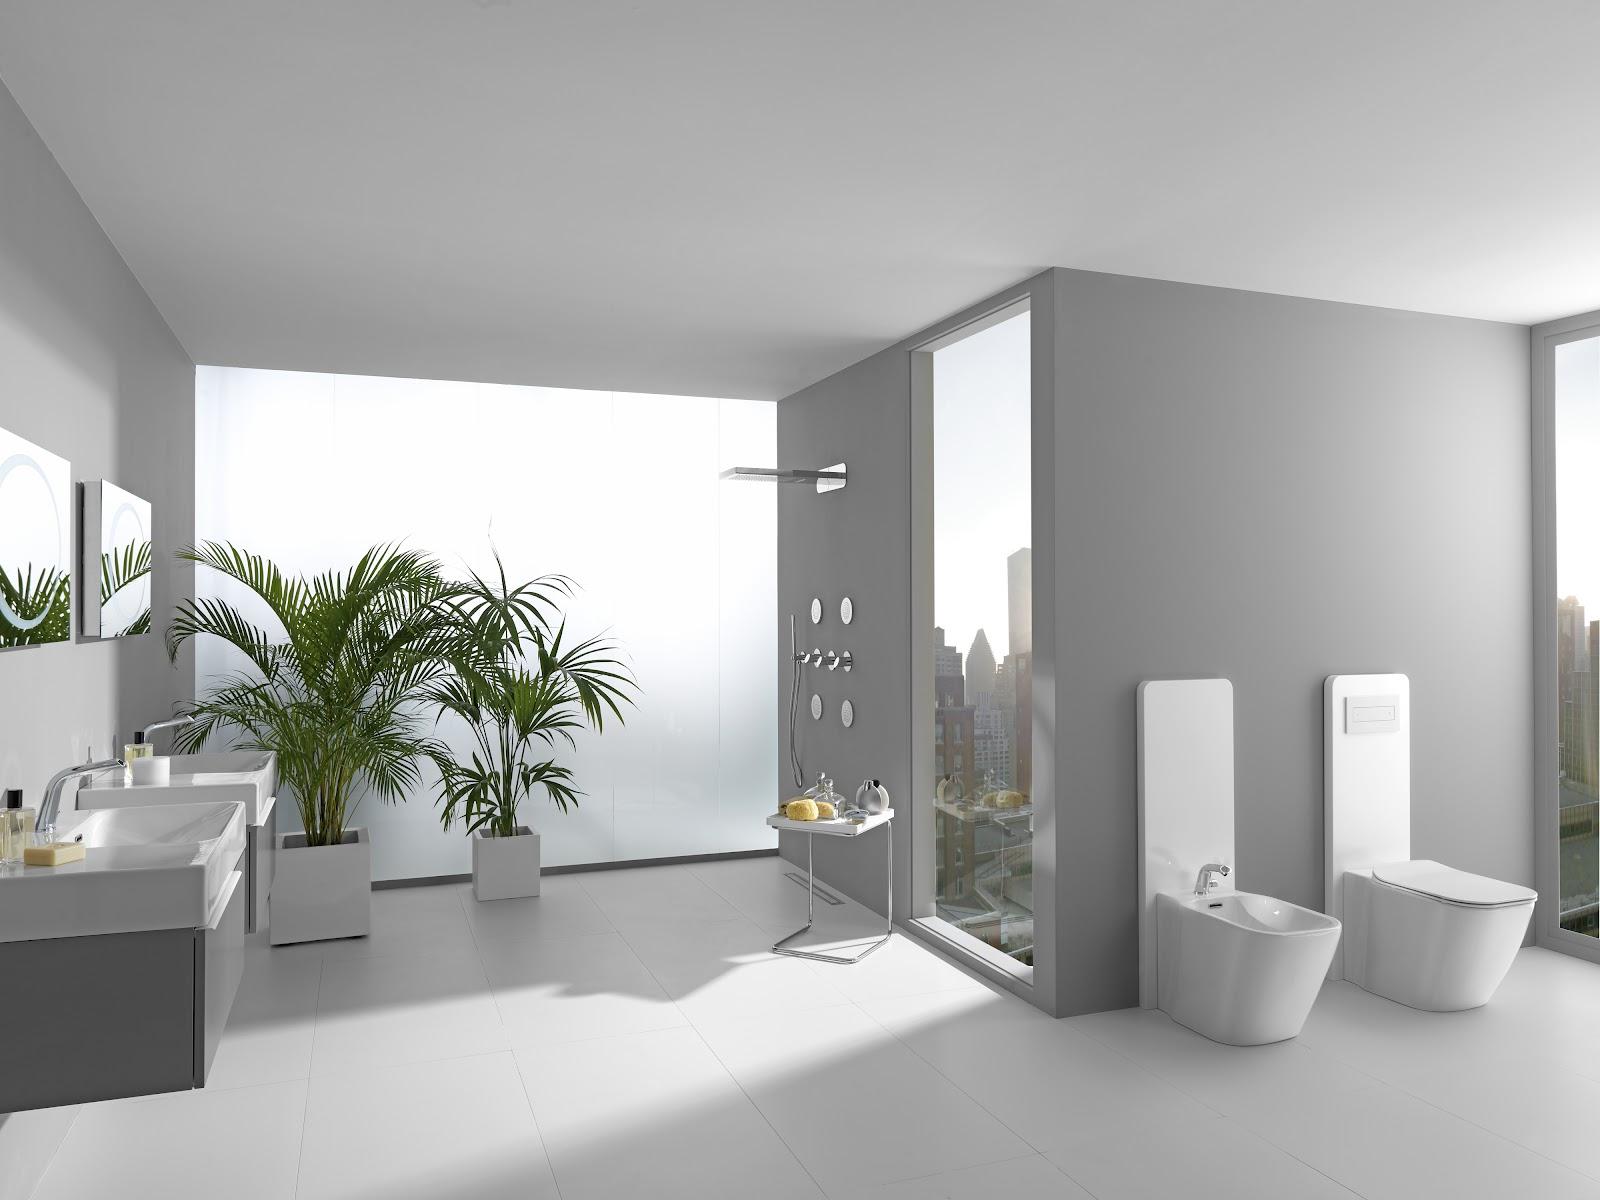 Essence-C de Noken, alta costura para el baño | Porcelanosa blog